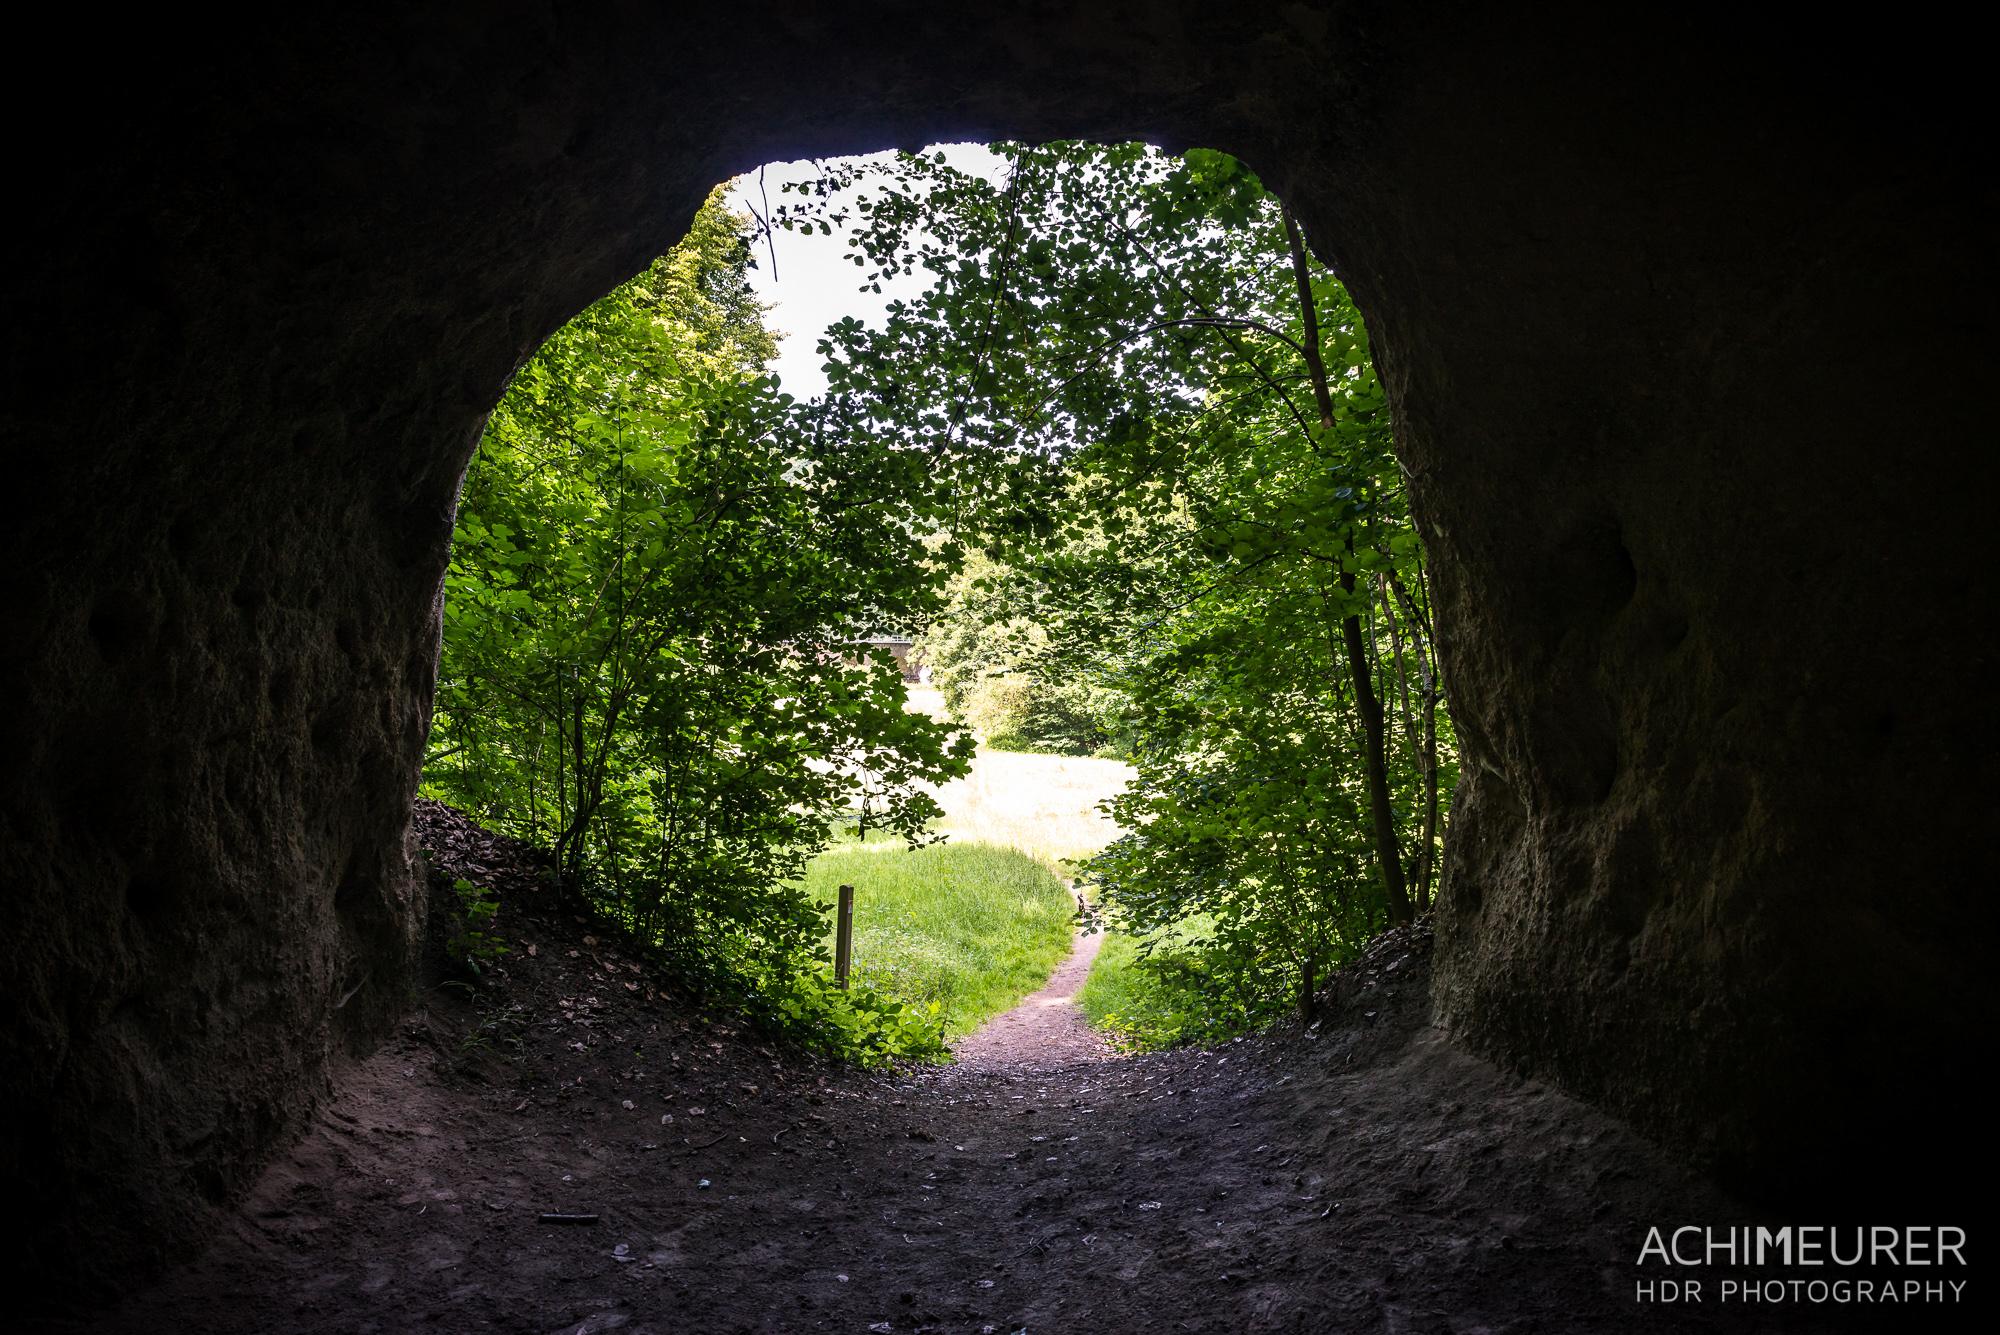 Eifel-Rheinland-Pfalz-Brohltal_5775